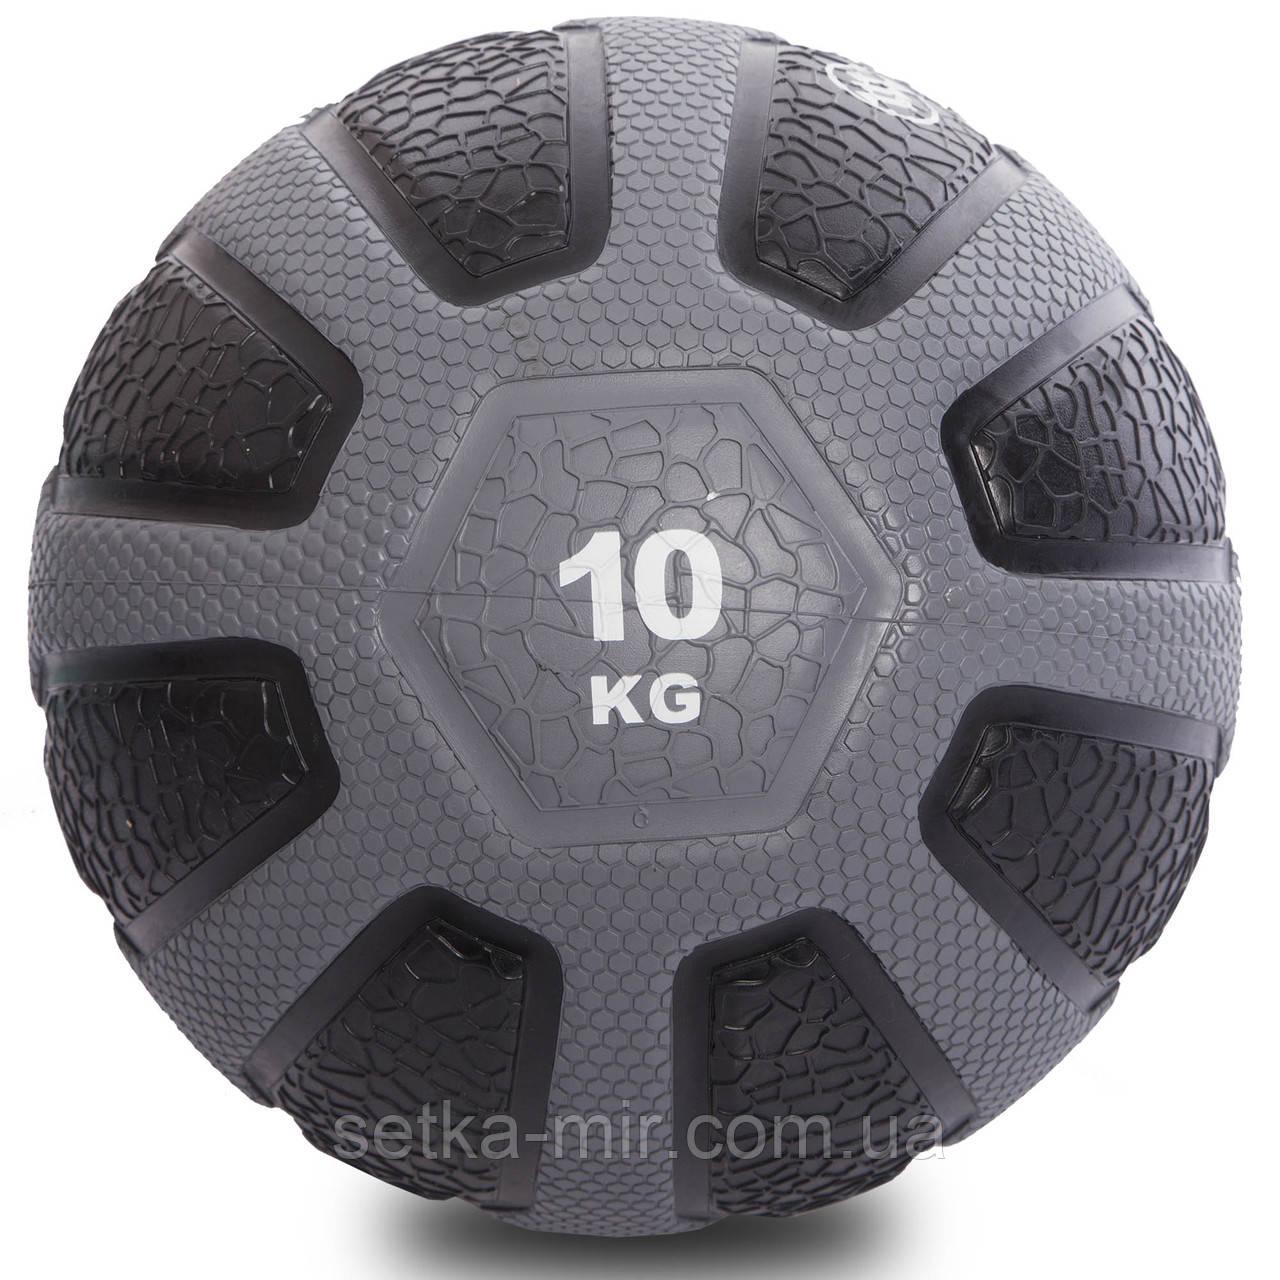 М'яч медичний медбол Zelart Medicine Ball FI-0898-10 10кг